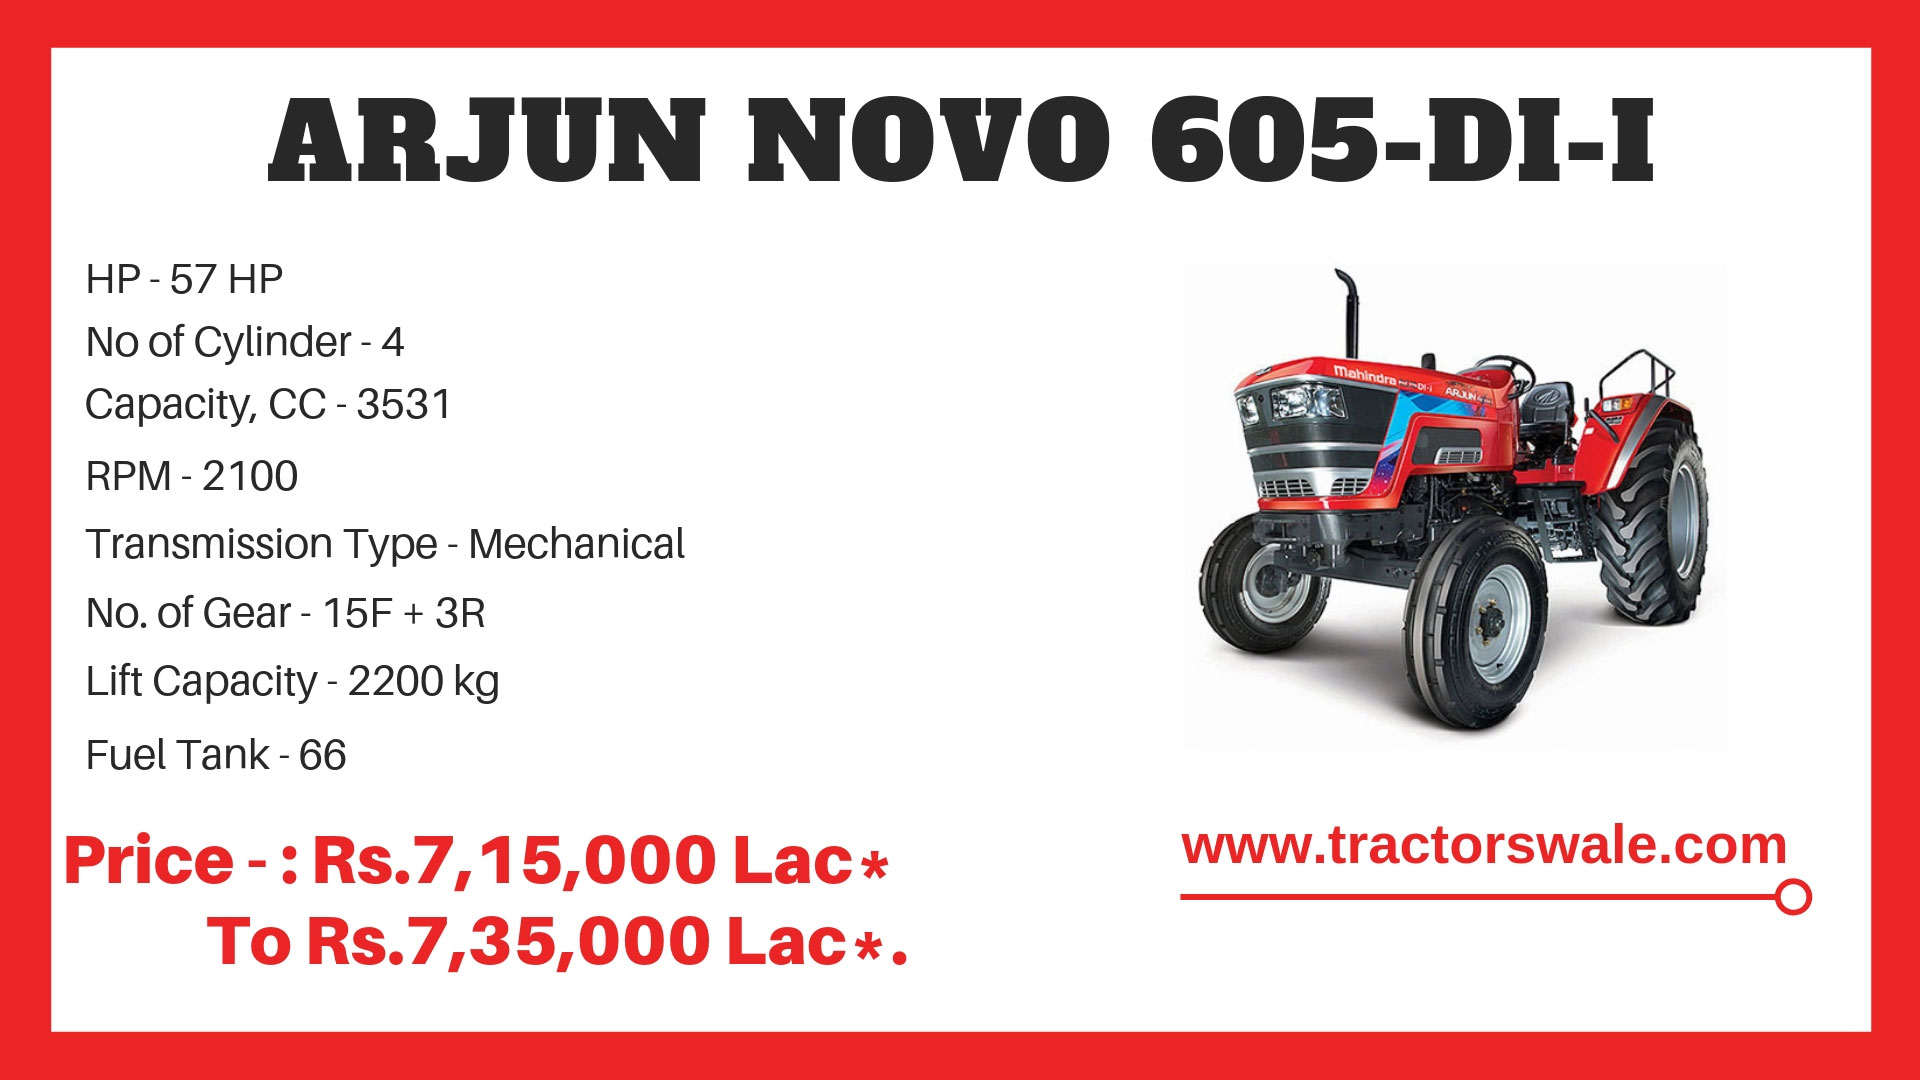 Mahindra-Arjun-Tractor-2019-NOVO-605-DI-I